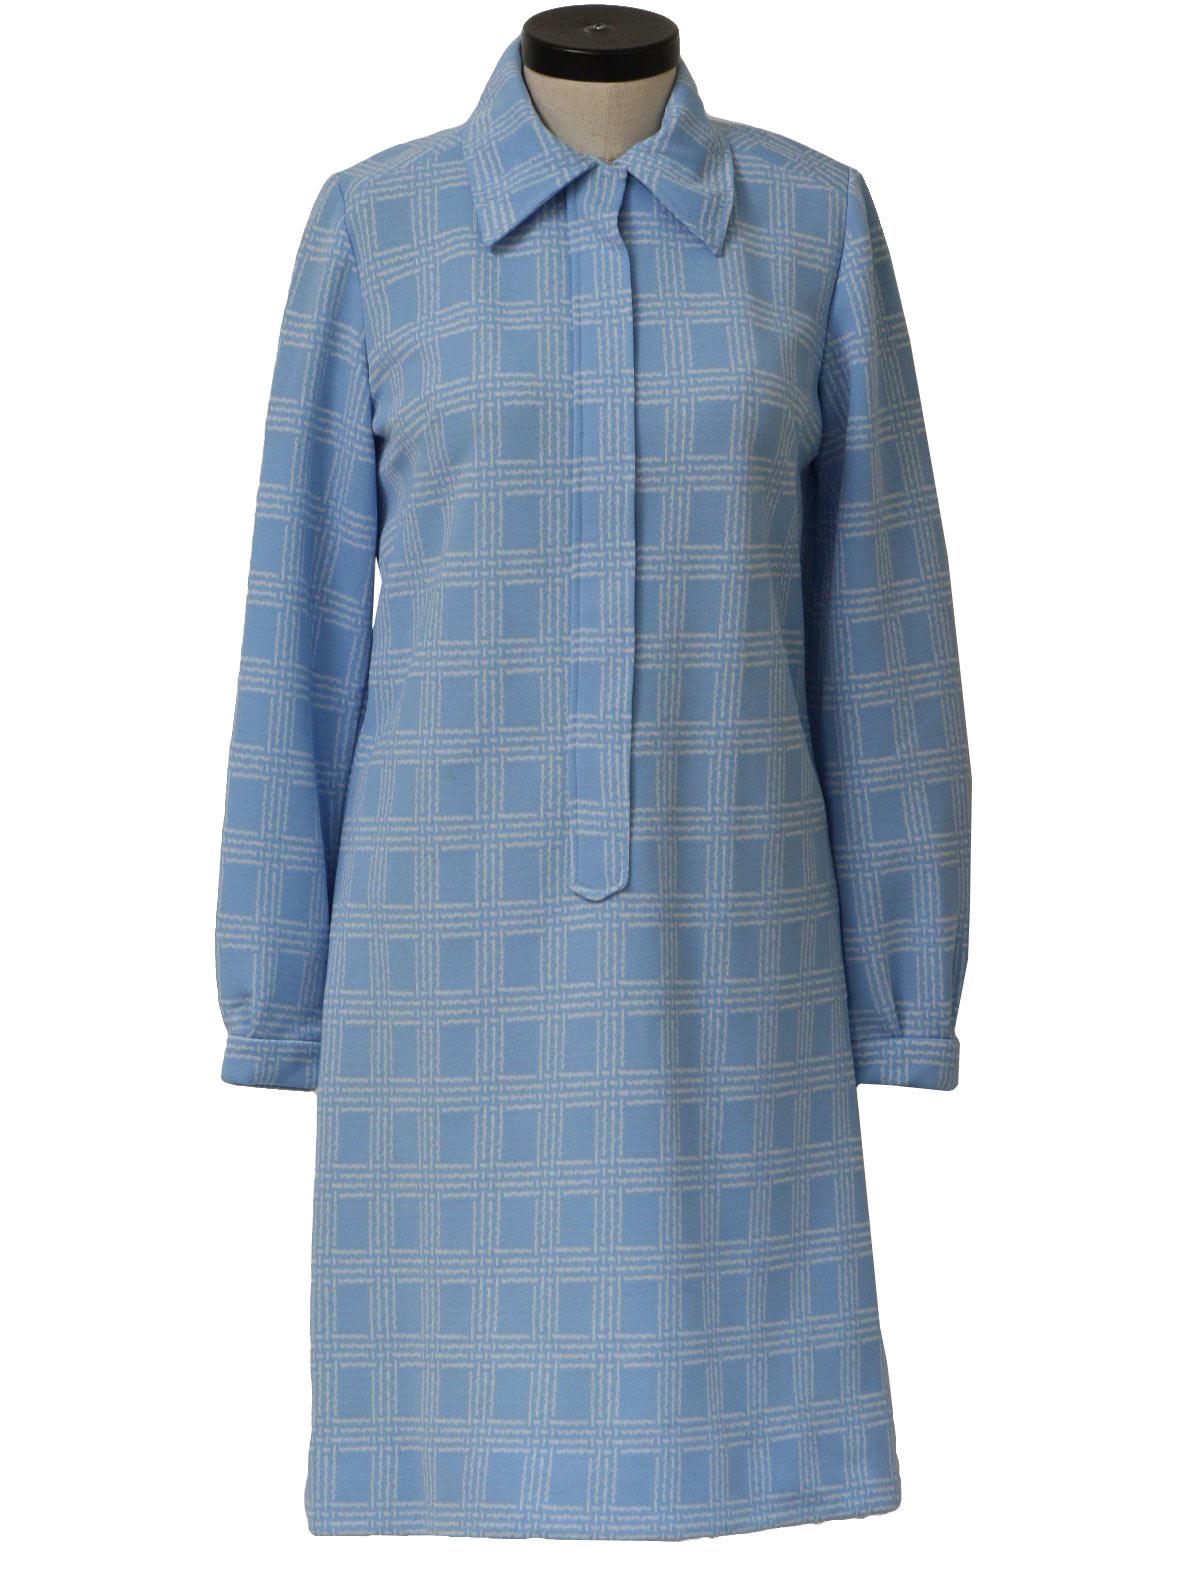 Long Sleeve Knit Dress Pattern : 70s Dress: 70s -no label- Womens sky blue and white polyester knit long ...